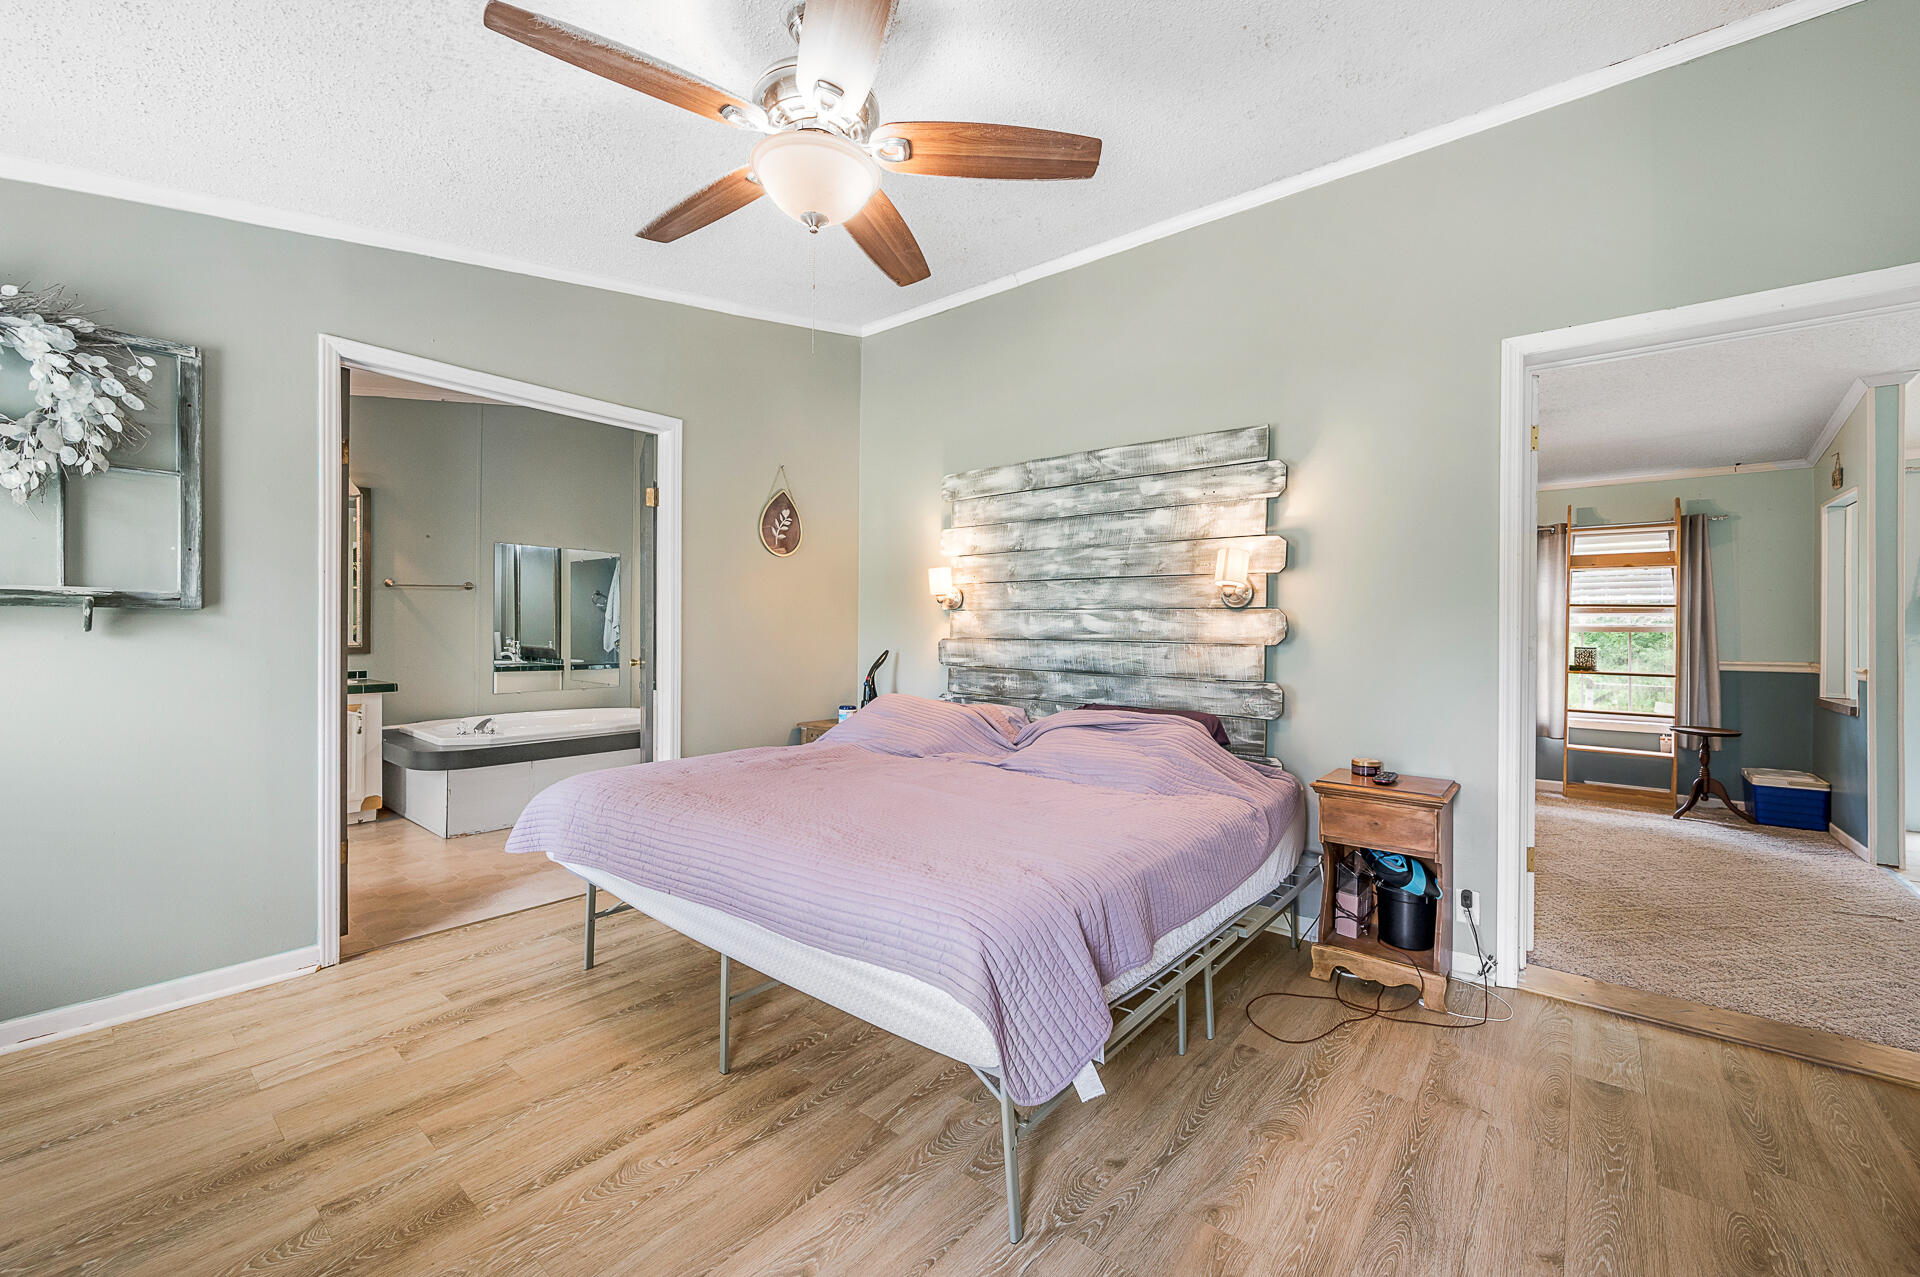 Clemson Terrace Homes For Sale - 250 Medina, Summerville, SC - 10